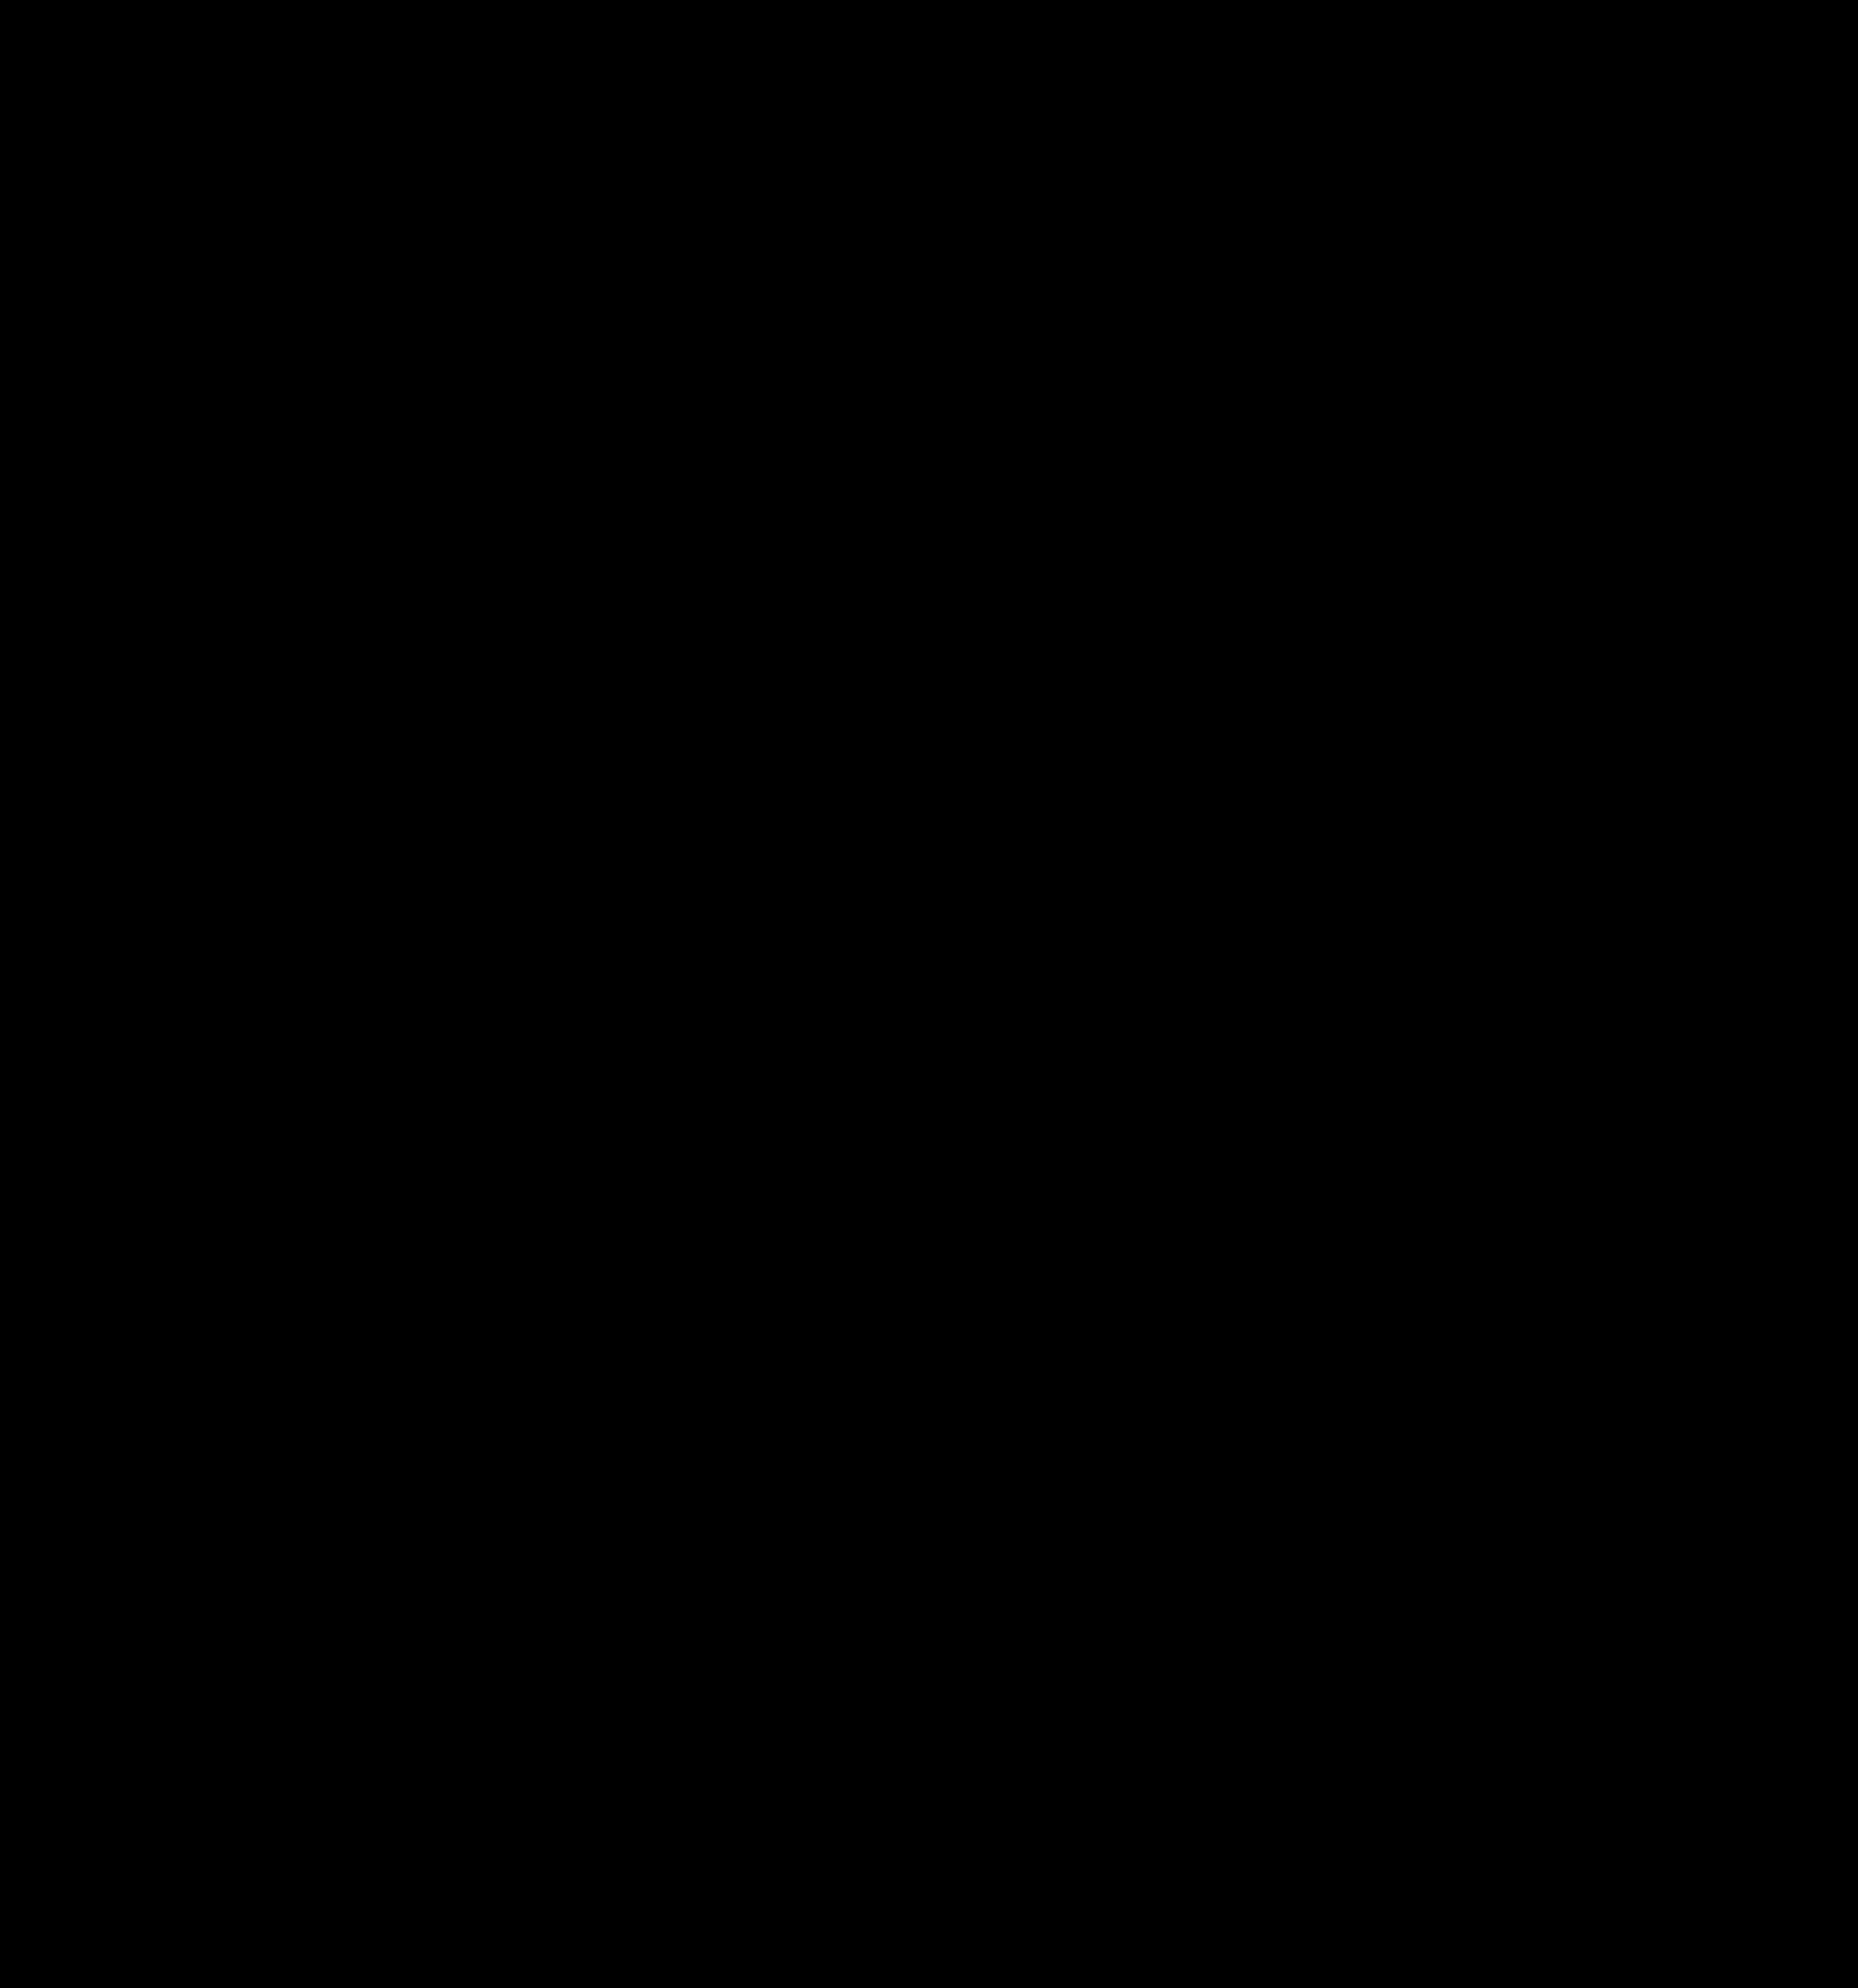 2166x2318 Clipart